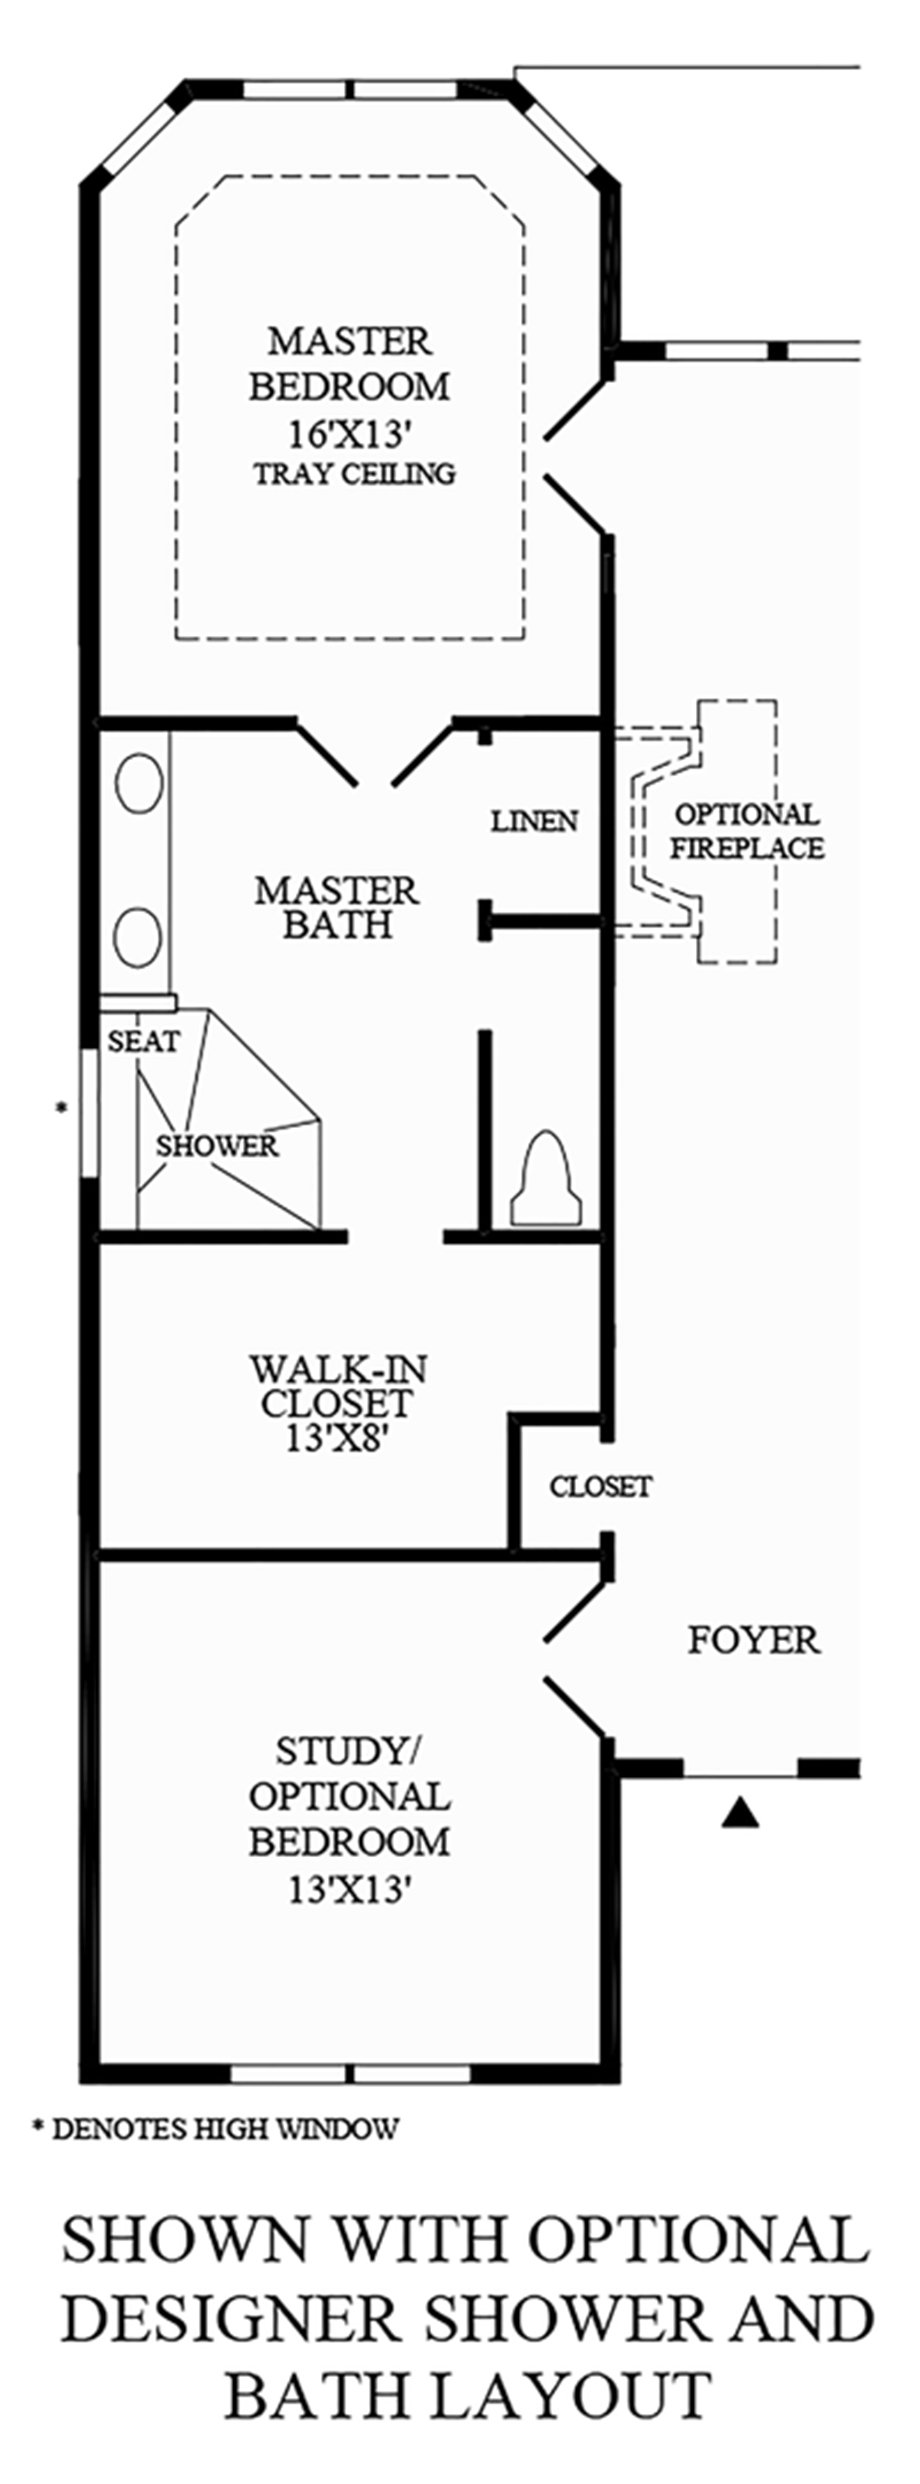 Optional Designer Shower and Bath Layout Floor Plan